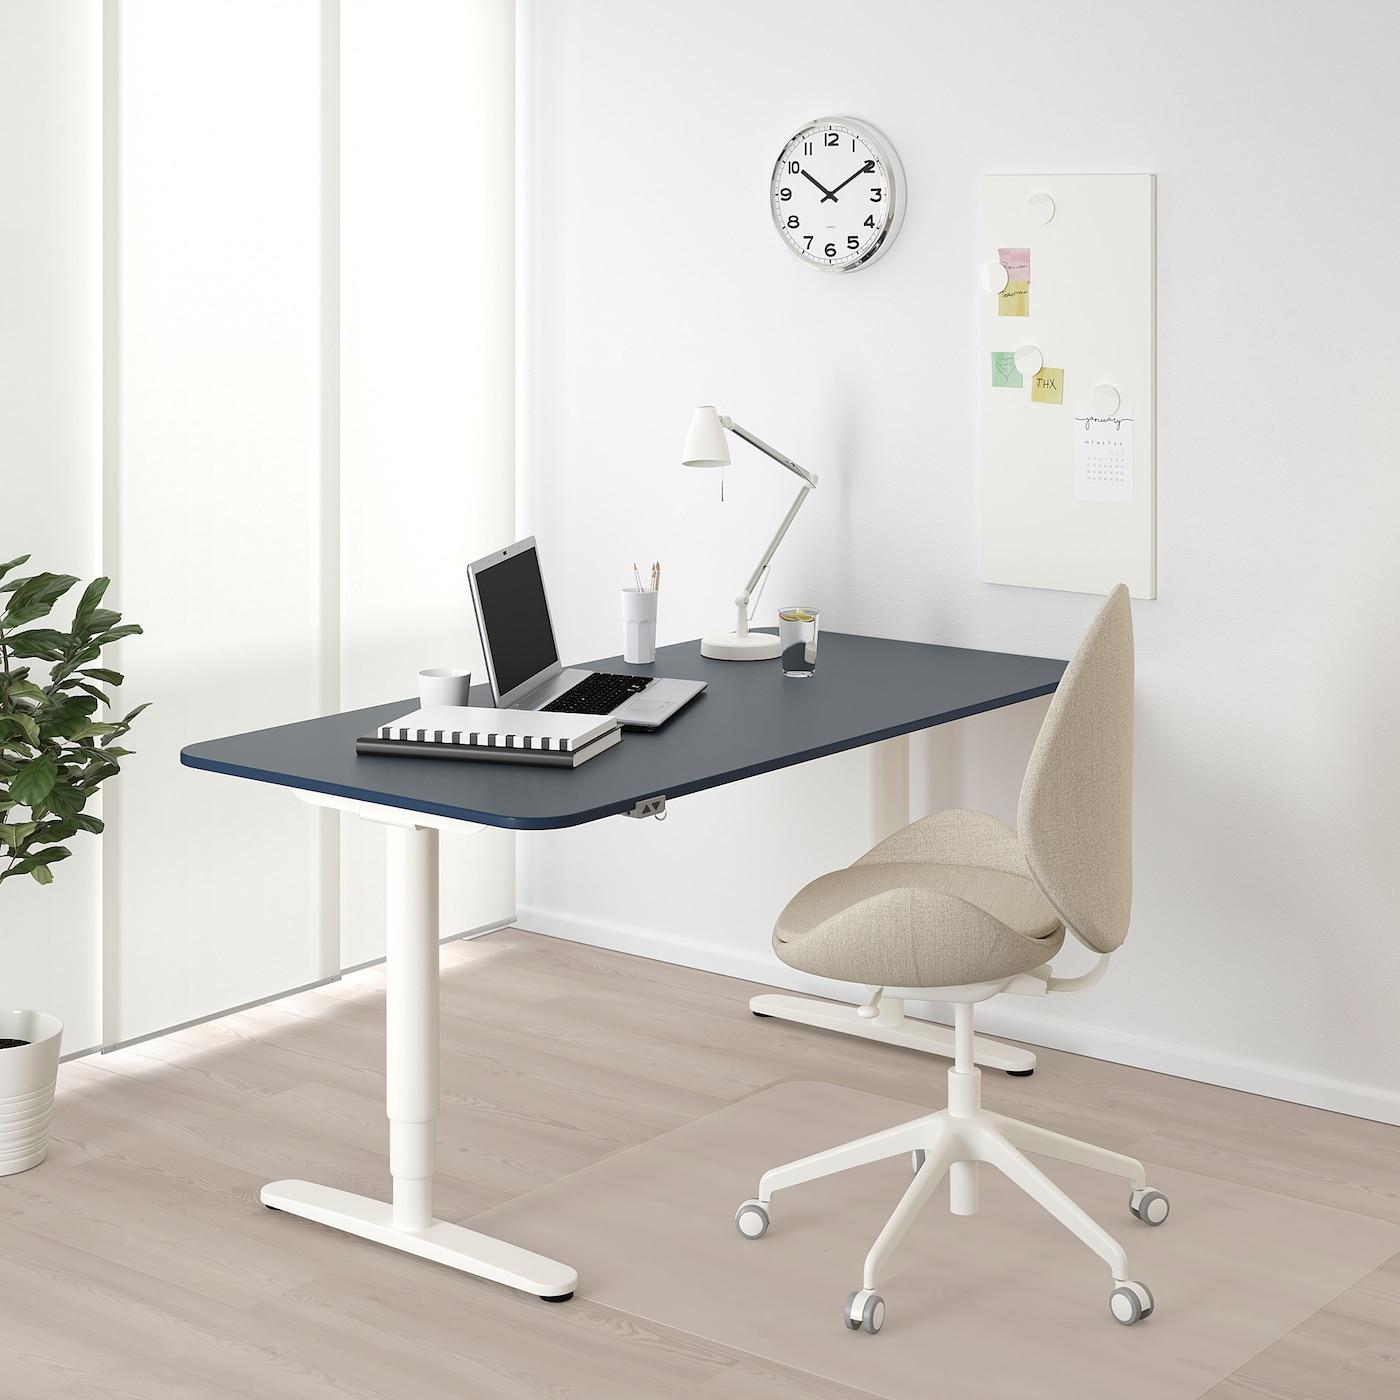 BEKANT مكتب متغيّر الارتفاع, مشمع أزرق/أبيض, 160x80 سم